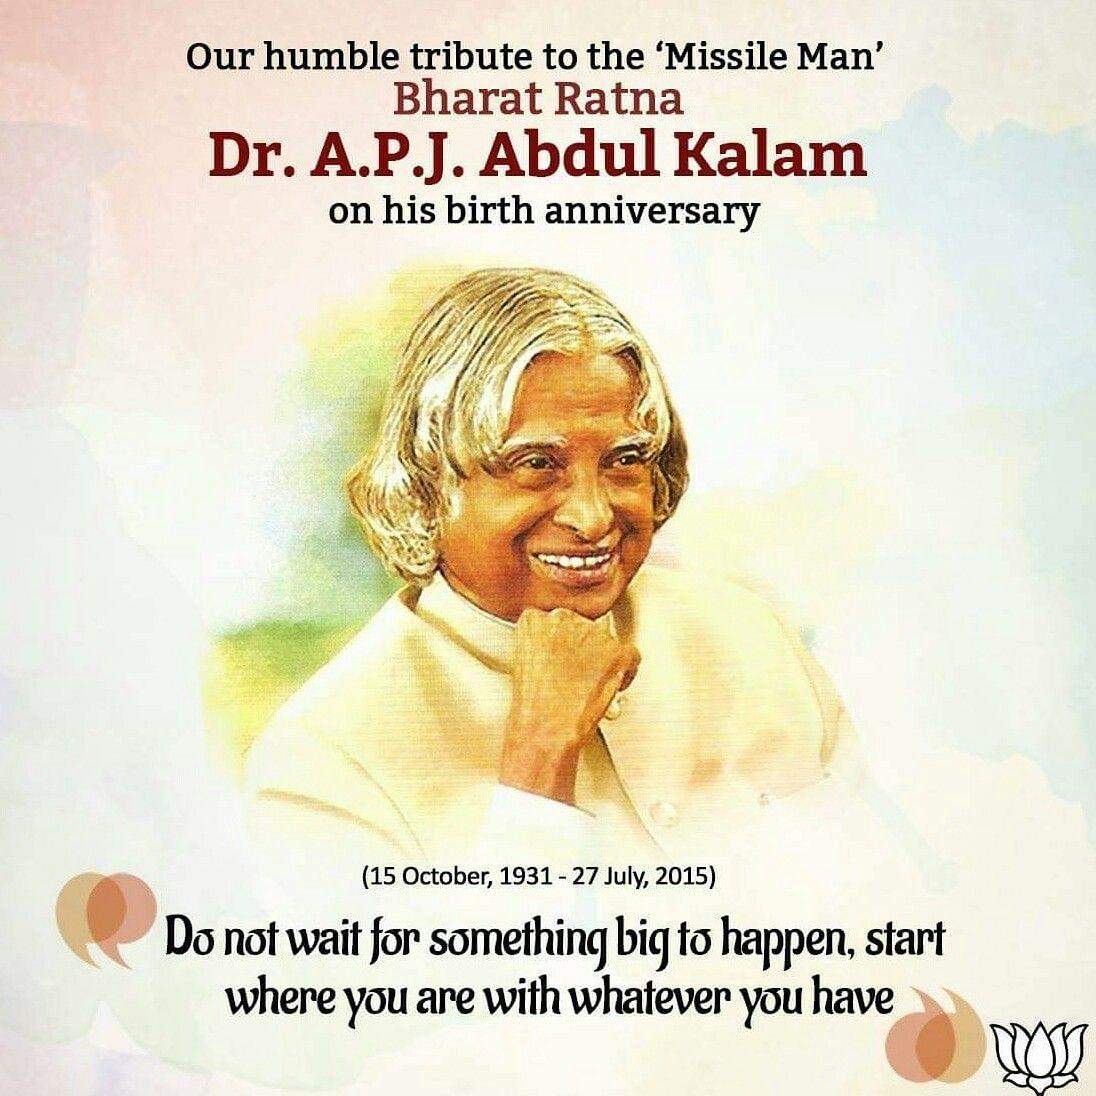 Remembering Apj Abdul kalam Sir on his Birth anniversary